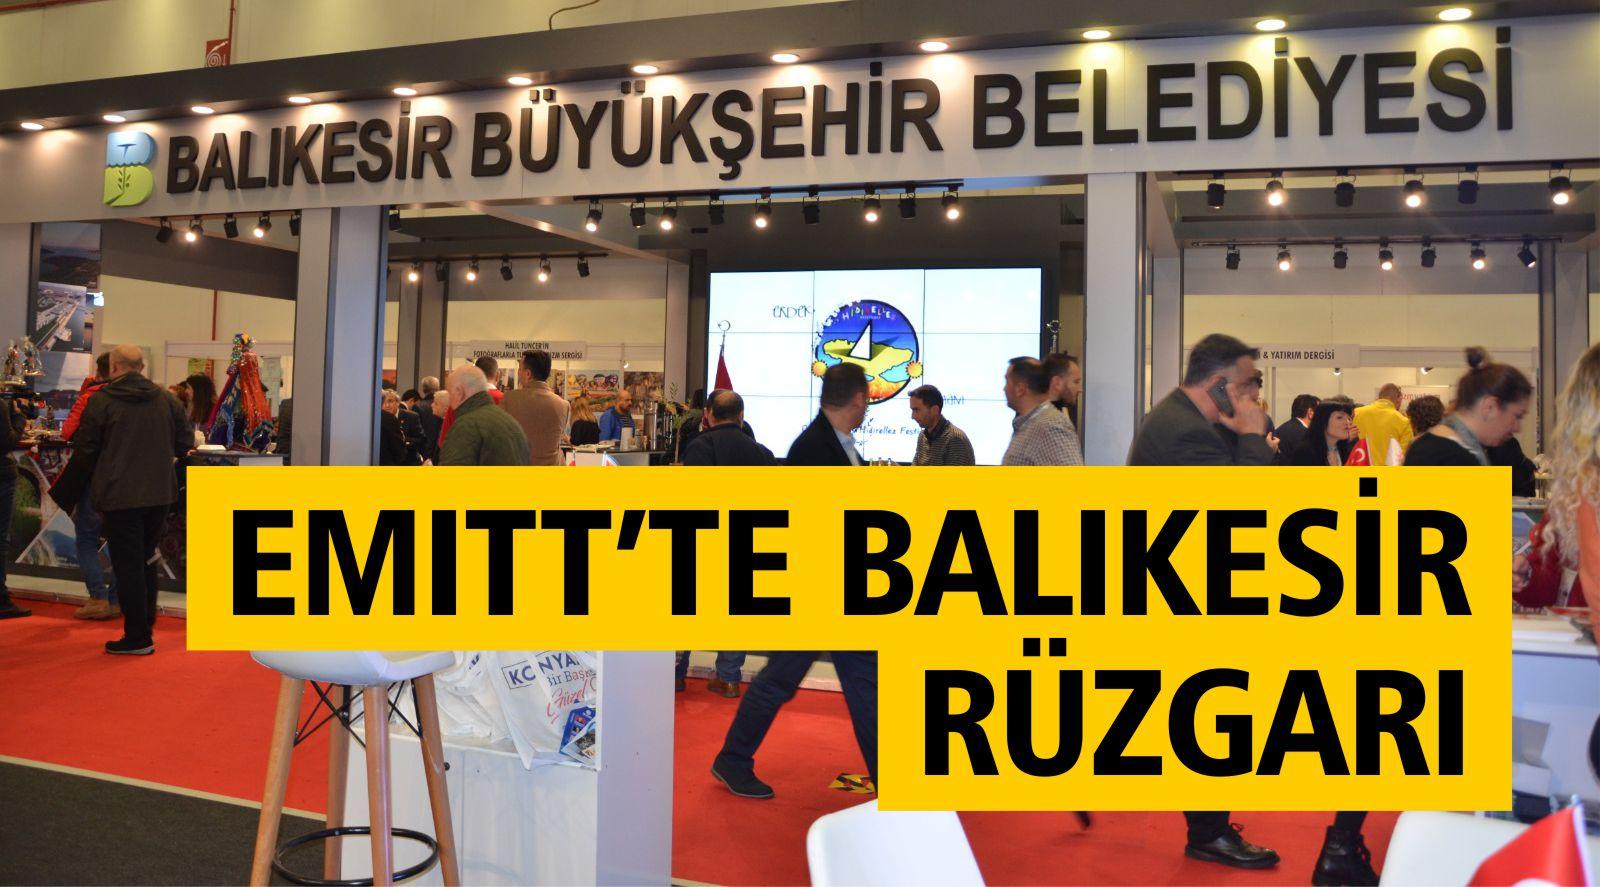 EMITT'TE BALIKESİR RÜZGARI ESTİ